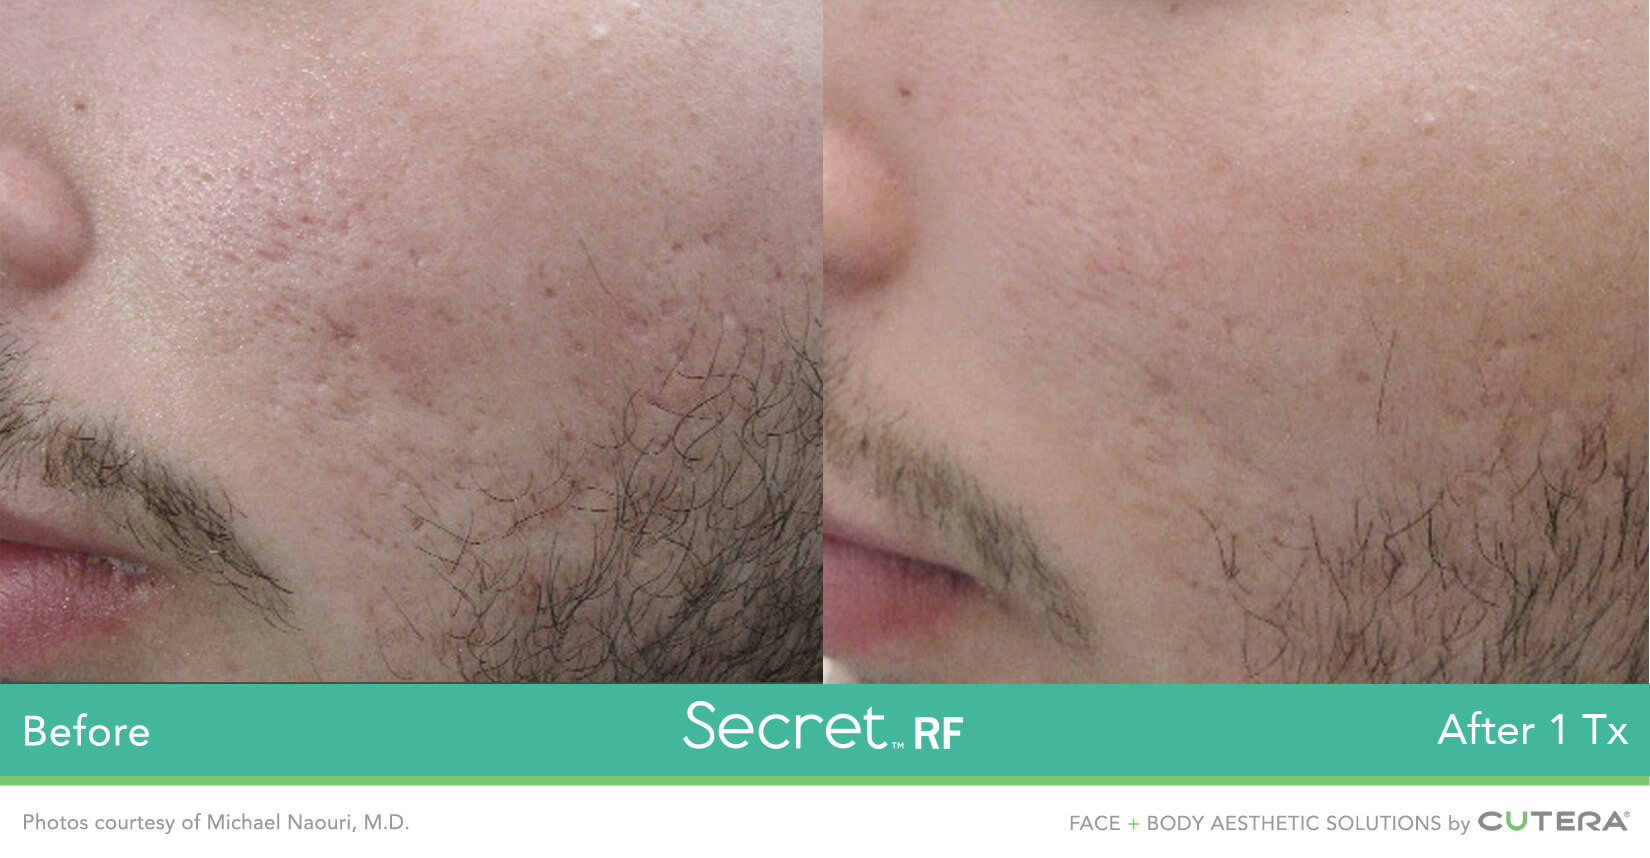 Acne Scar Removal With Secret Rf Microneedling Miami Skin Spa